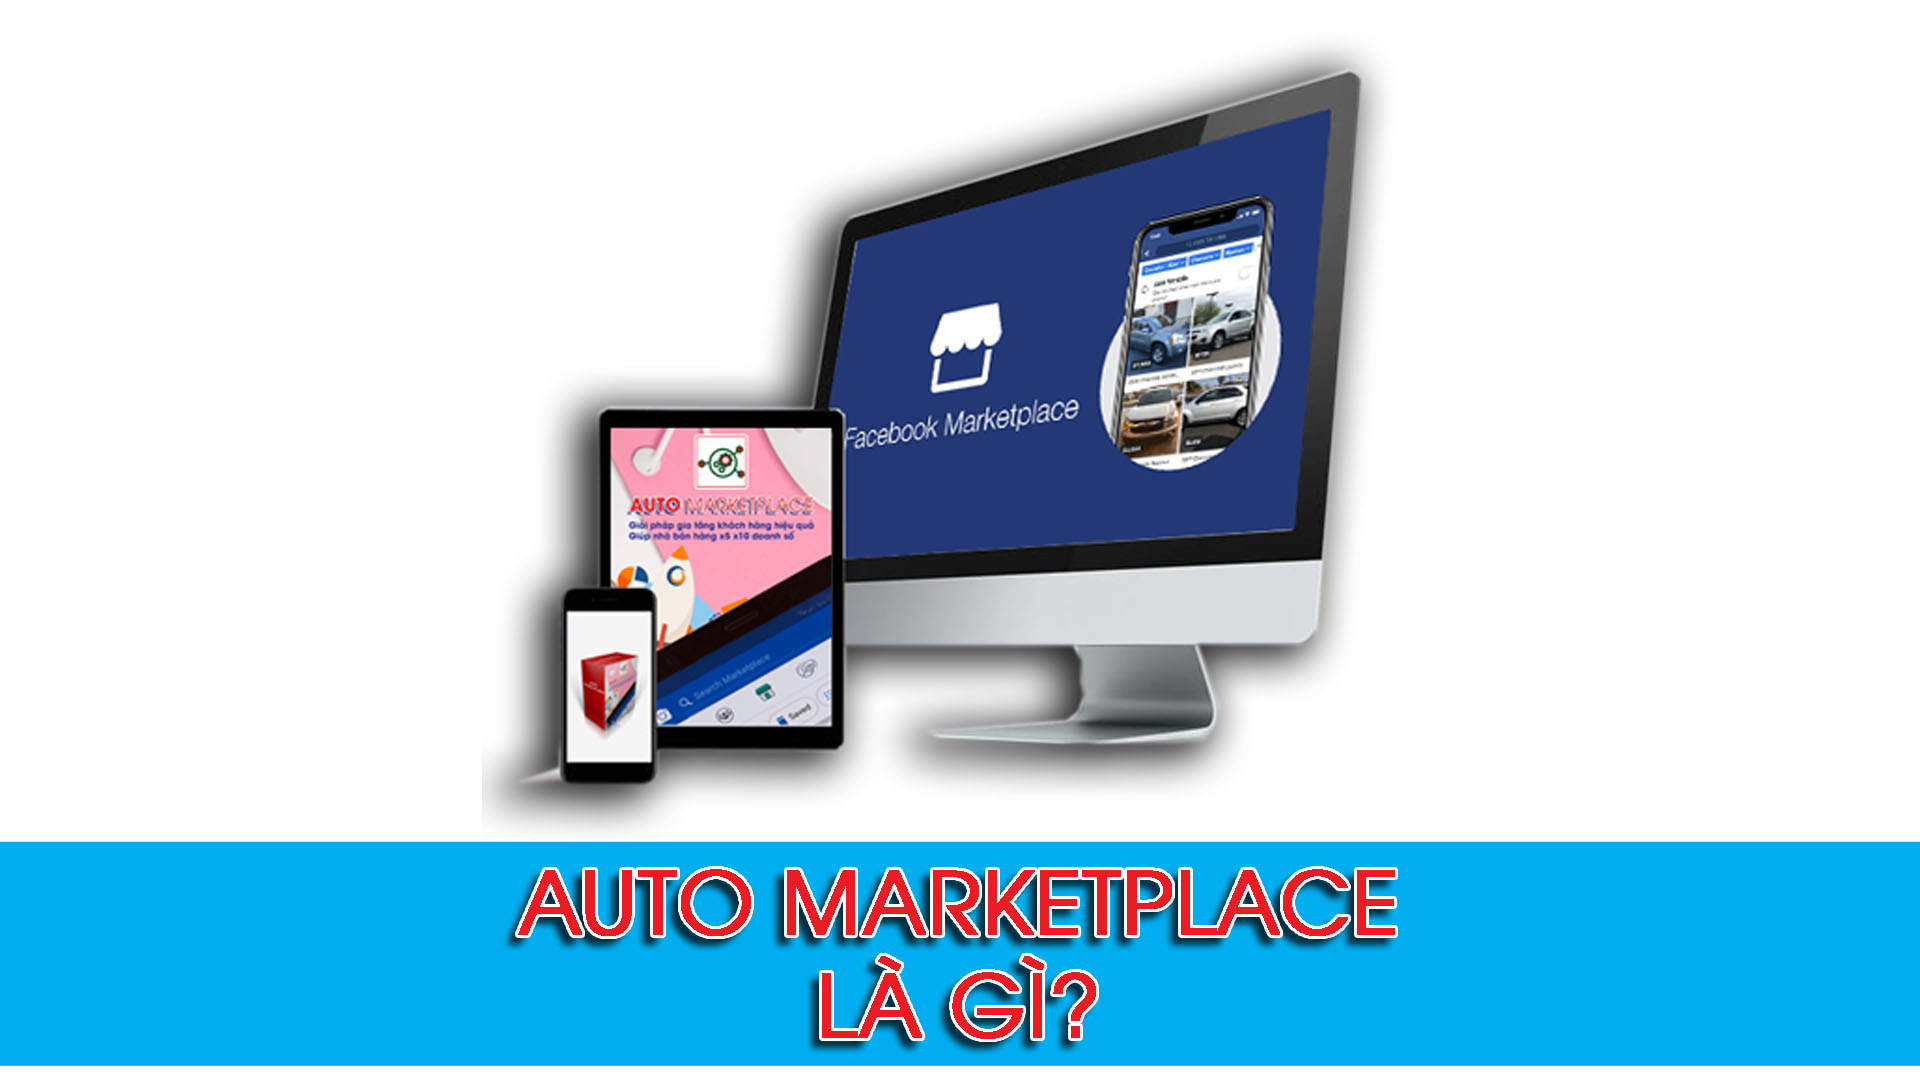 Auto Marketplace là gì?